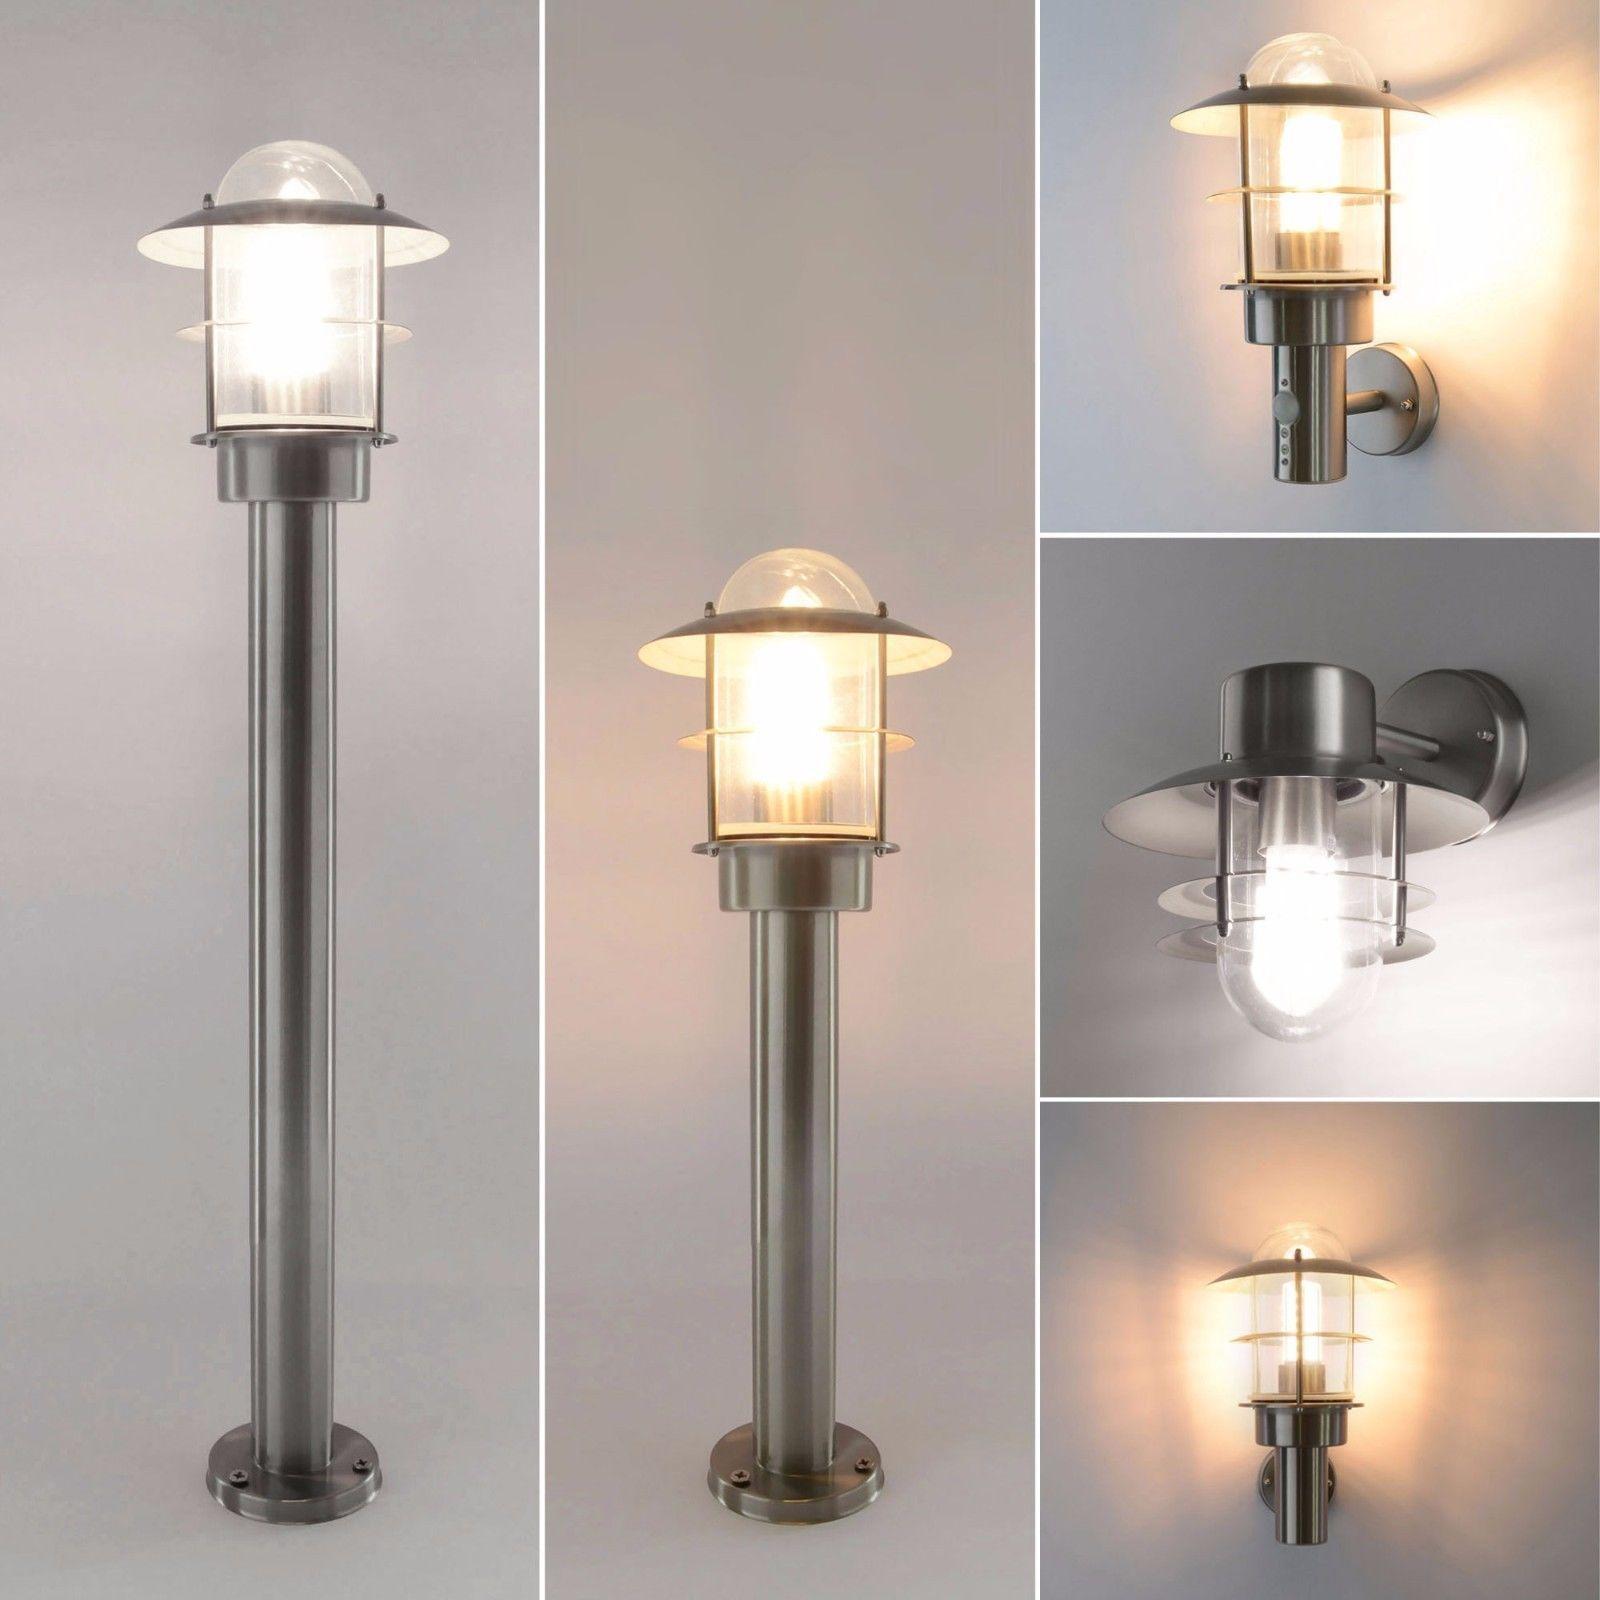 Au/ßenleuchte Au/ßenlampe Wandleuchte mit Bewegungsmelder Edelstahl E27 Aussenwandleuchte Lampe Lampen 251